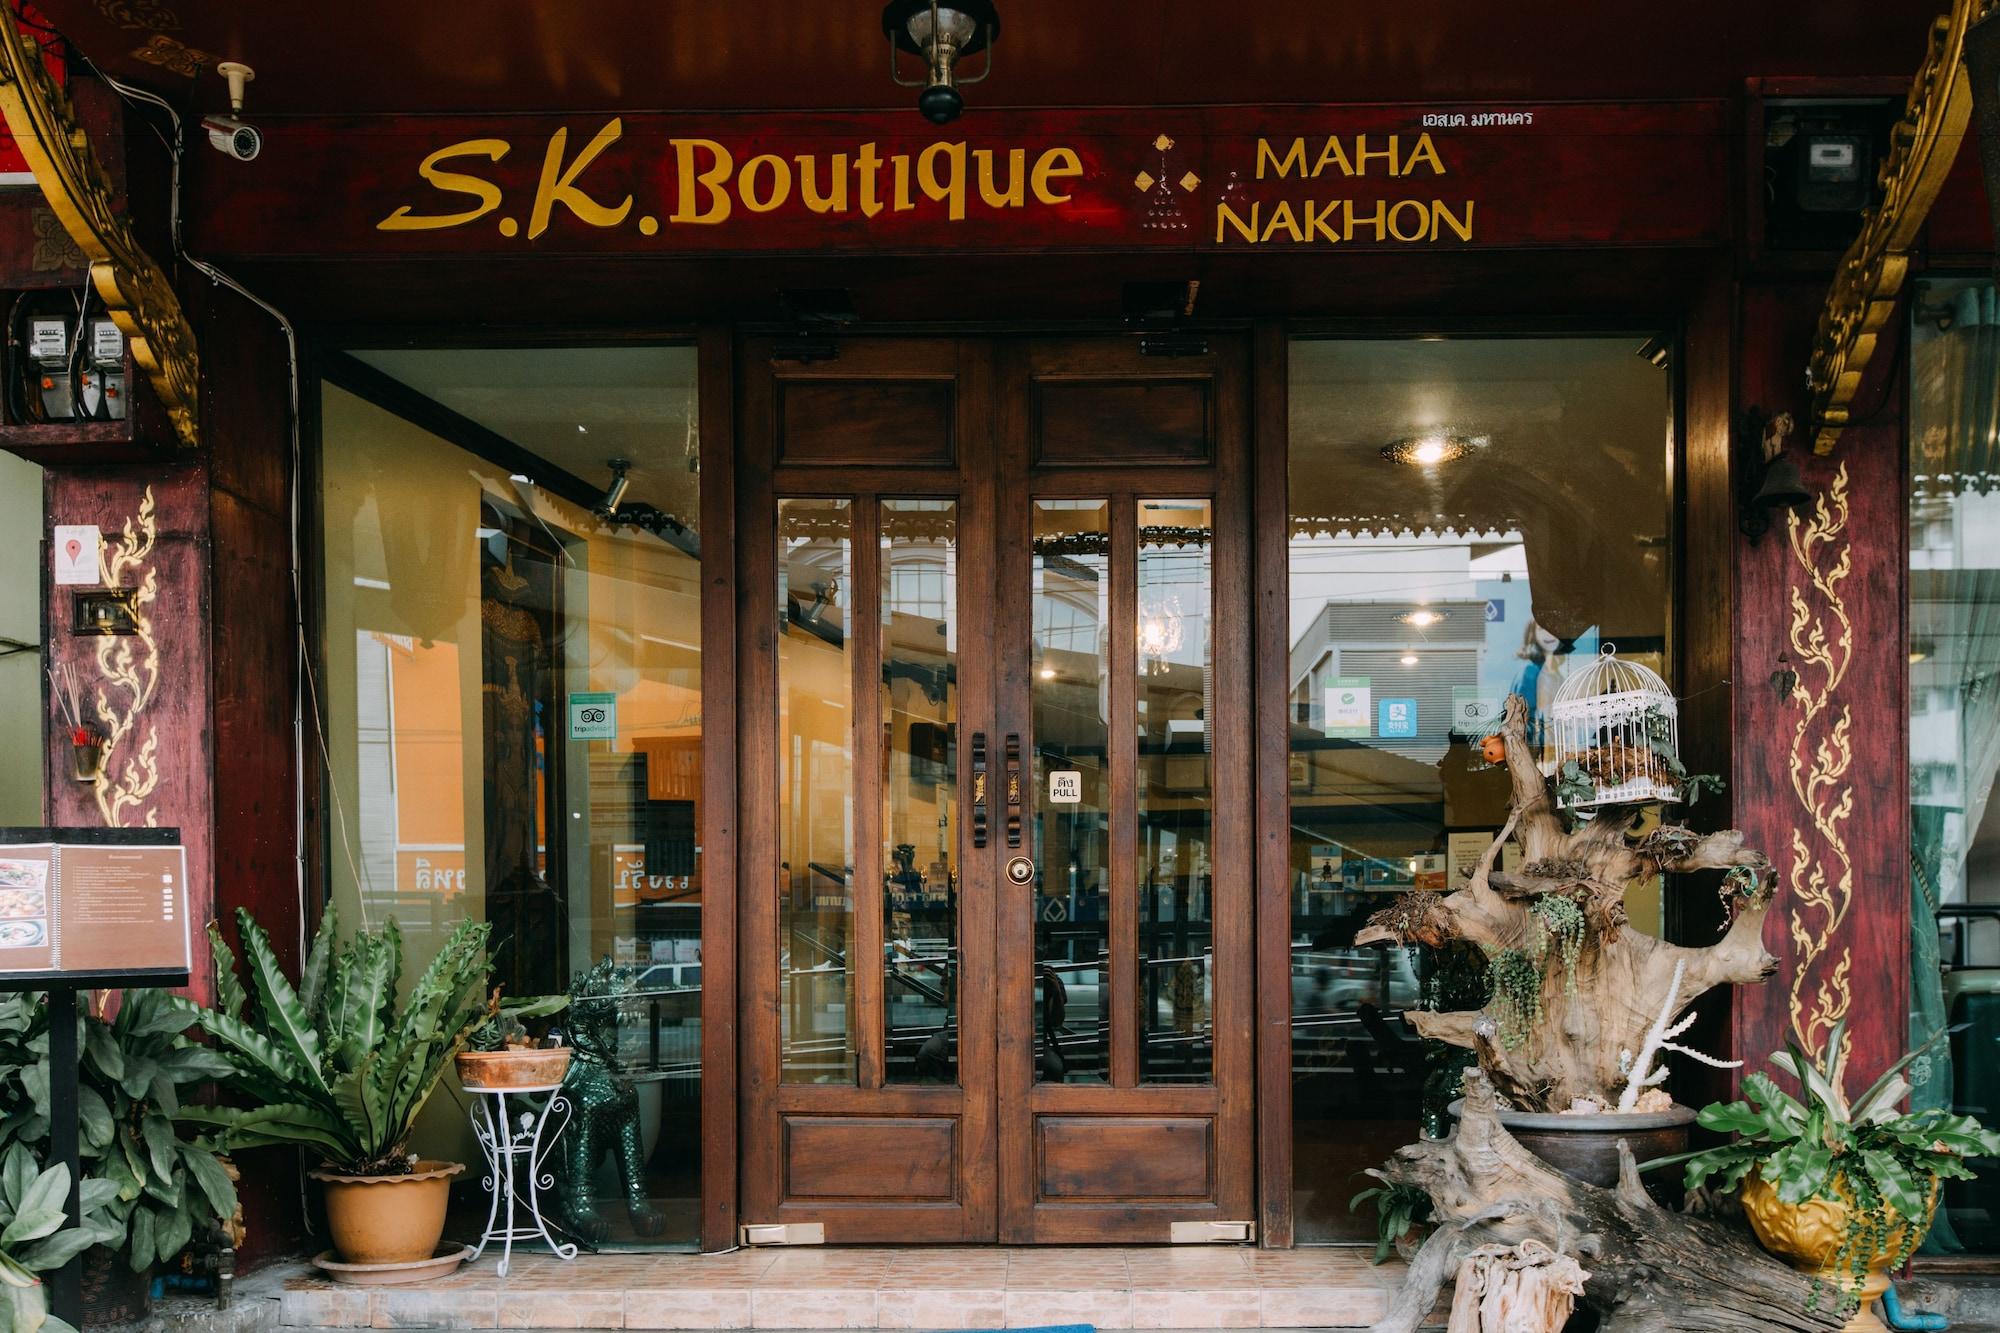 SK Boutique Maha Nakhon, Bang Rak